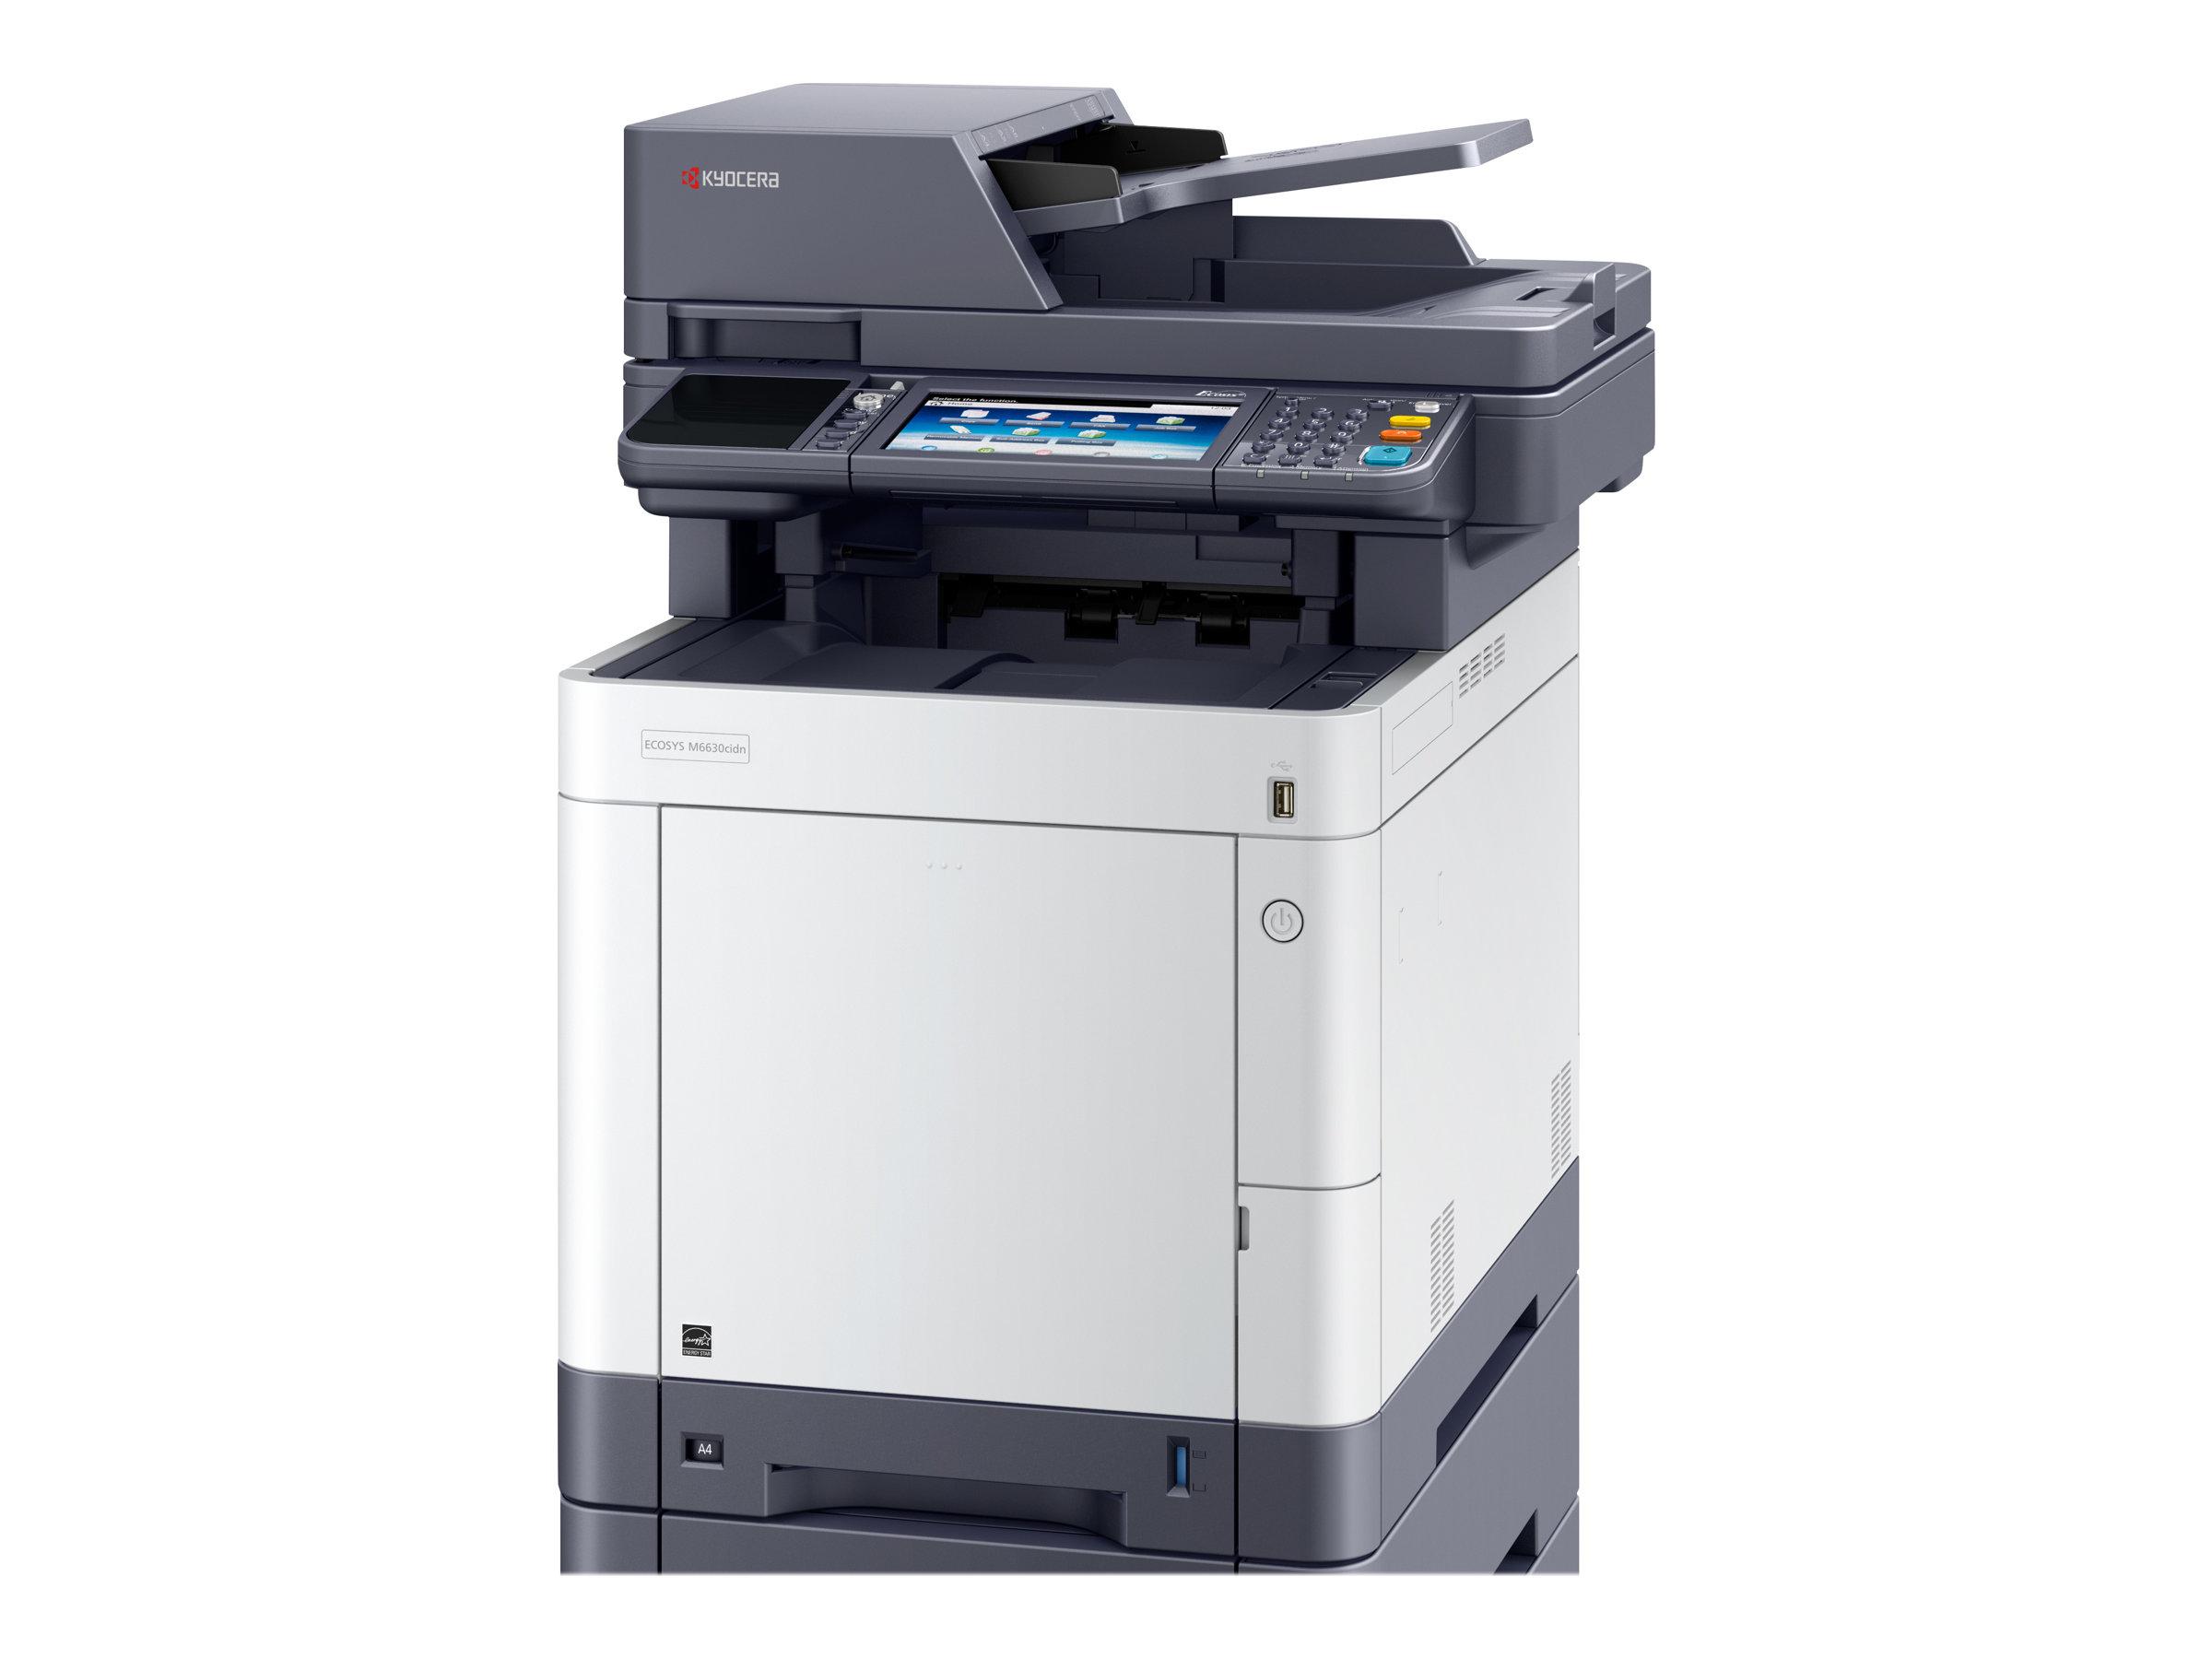 Kyocera ECOSYS M6630cidn - Multifunktionsdrucker - Farbe - Laser - Legal (216 x 356 mm)/A4 (210 x 297 mm) (Original) - A4/Legal